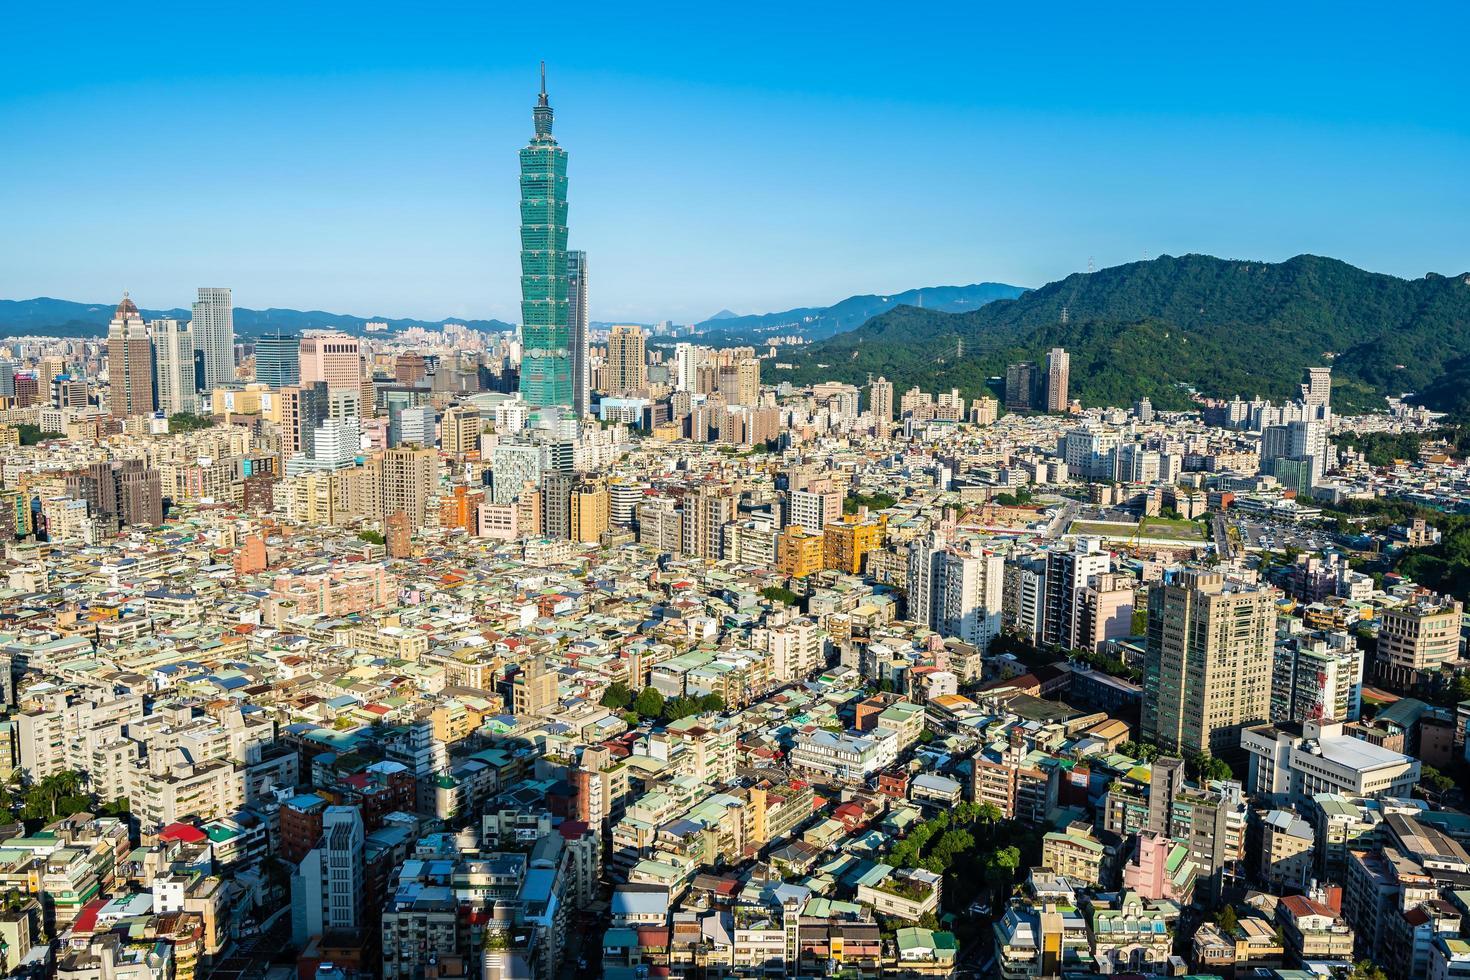 Taipei 101 Turm in der Stadt Taipeh, Taiwan foto